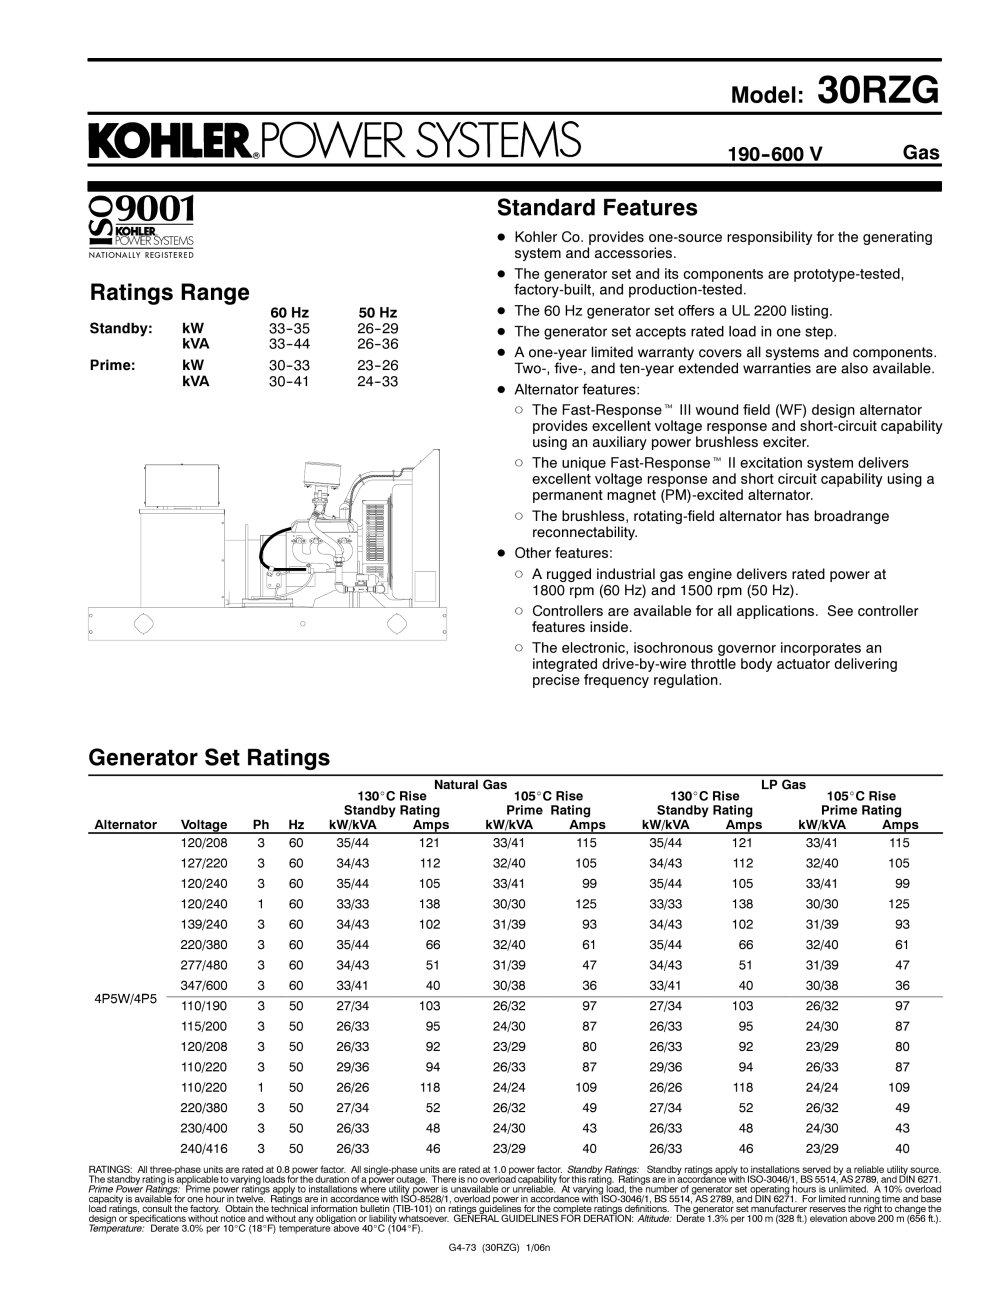 gas generators 30rzg 70589_1b?resize\\=665%2C861 diagrams 997759 kohler ignition wiring diagram kohler engine  at creativeand.co